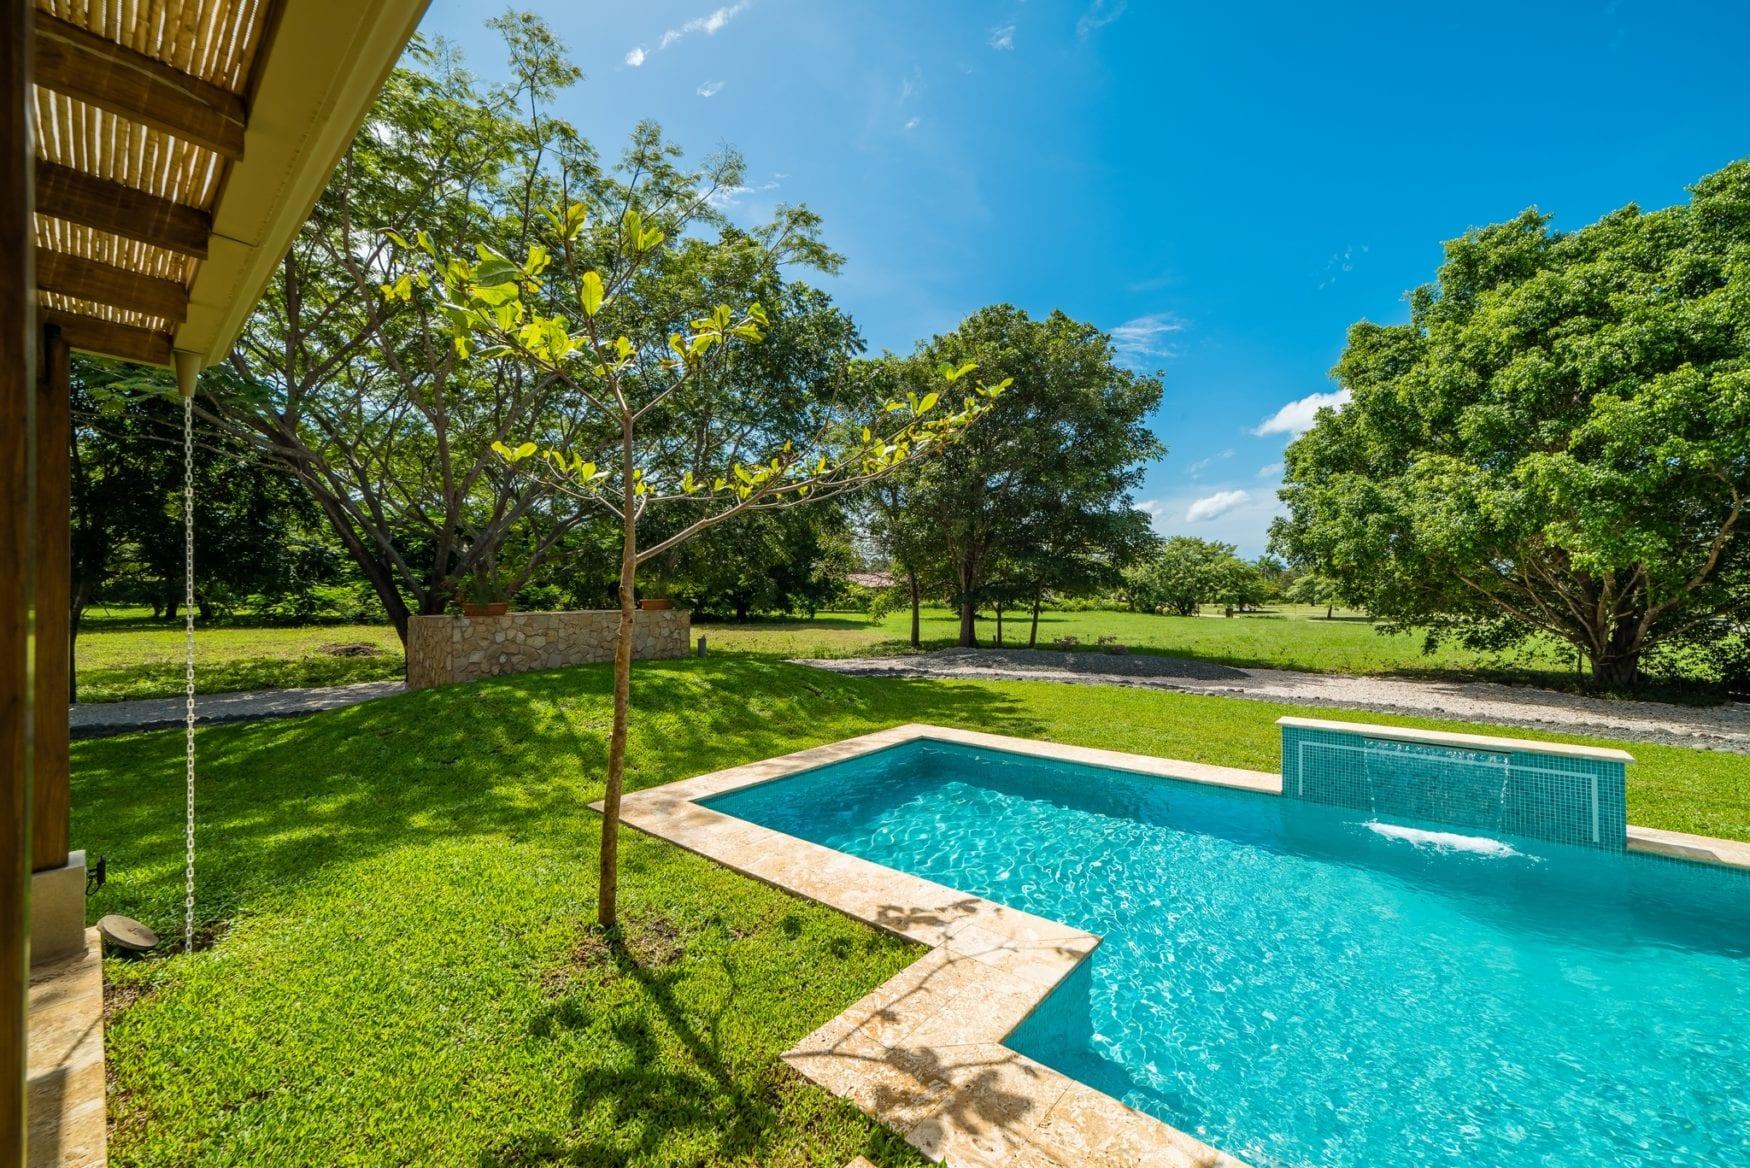 Swimming pool & garden 1